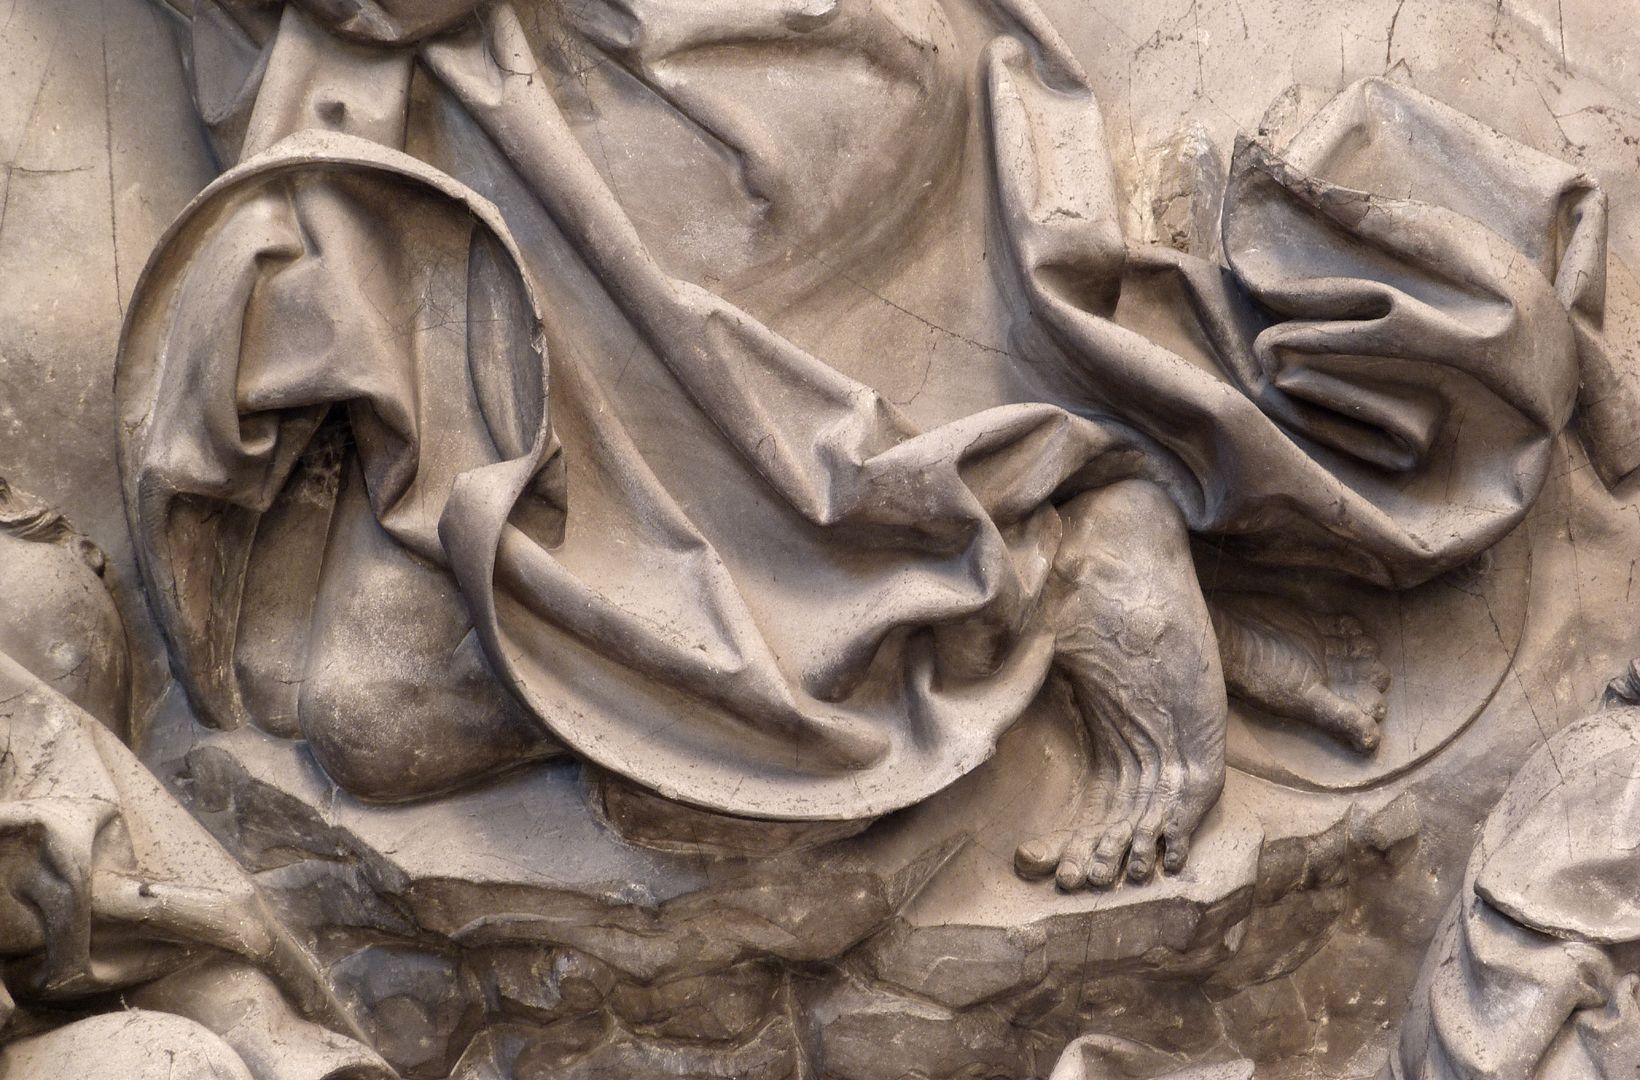 Volckamer Memorial Foundation, relief plates Ölberggebet, ohrmuschelförmiges Faltenwerk am Gewand Christi